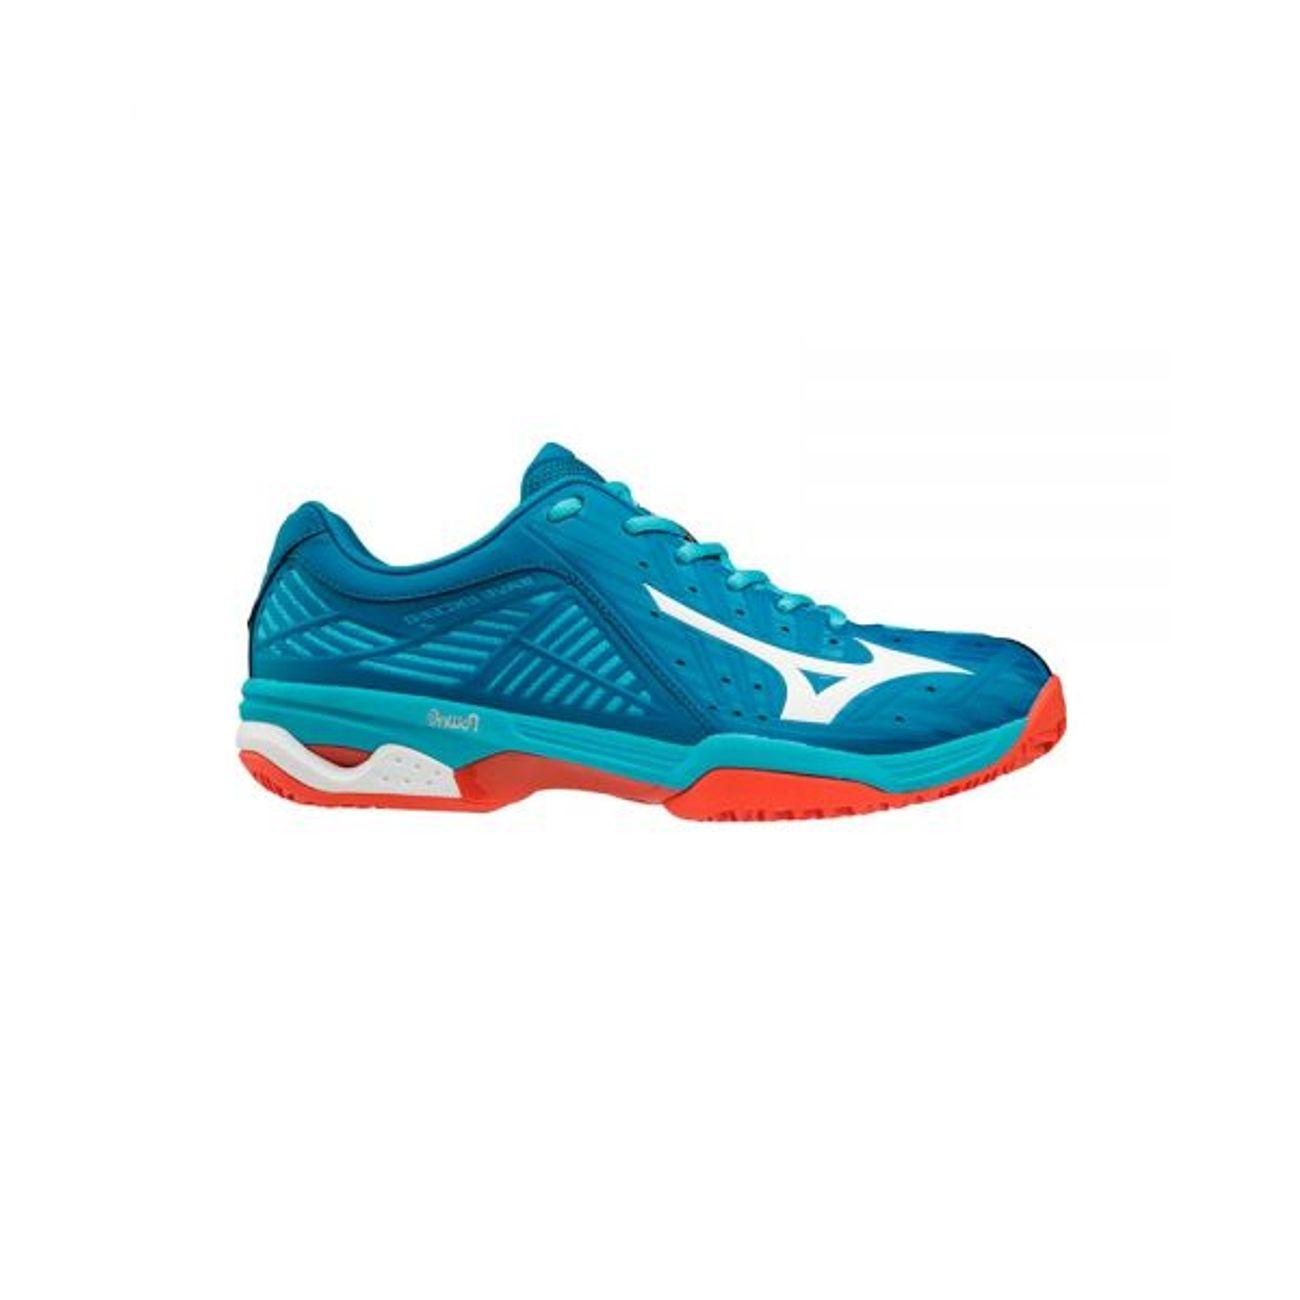 Homme Chaussures Cc Wave 2 Exceed Tennis Mizuno CrdhQts